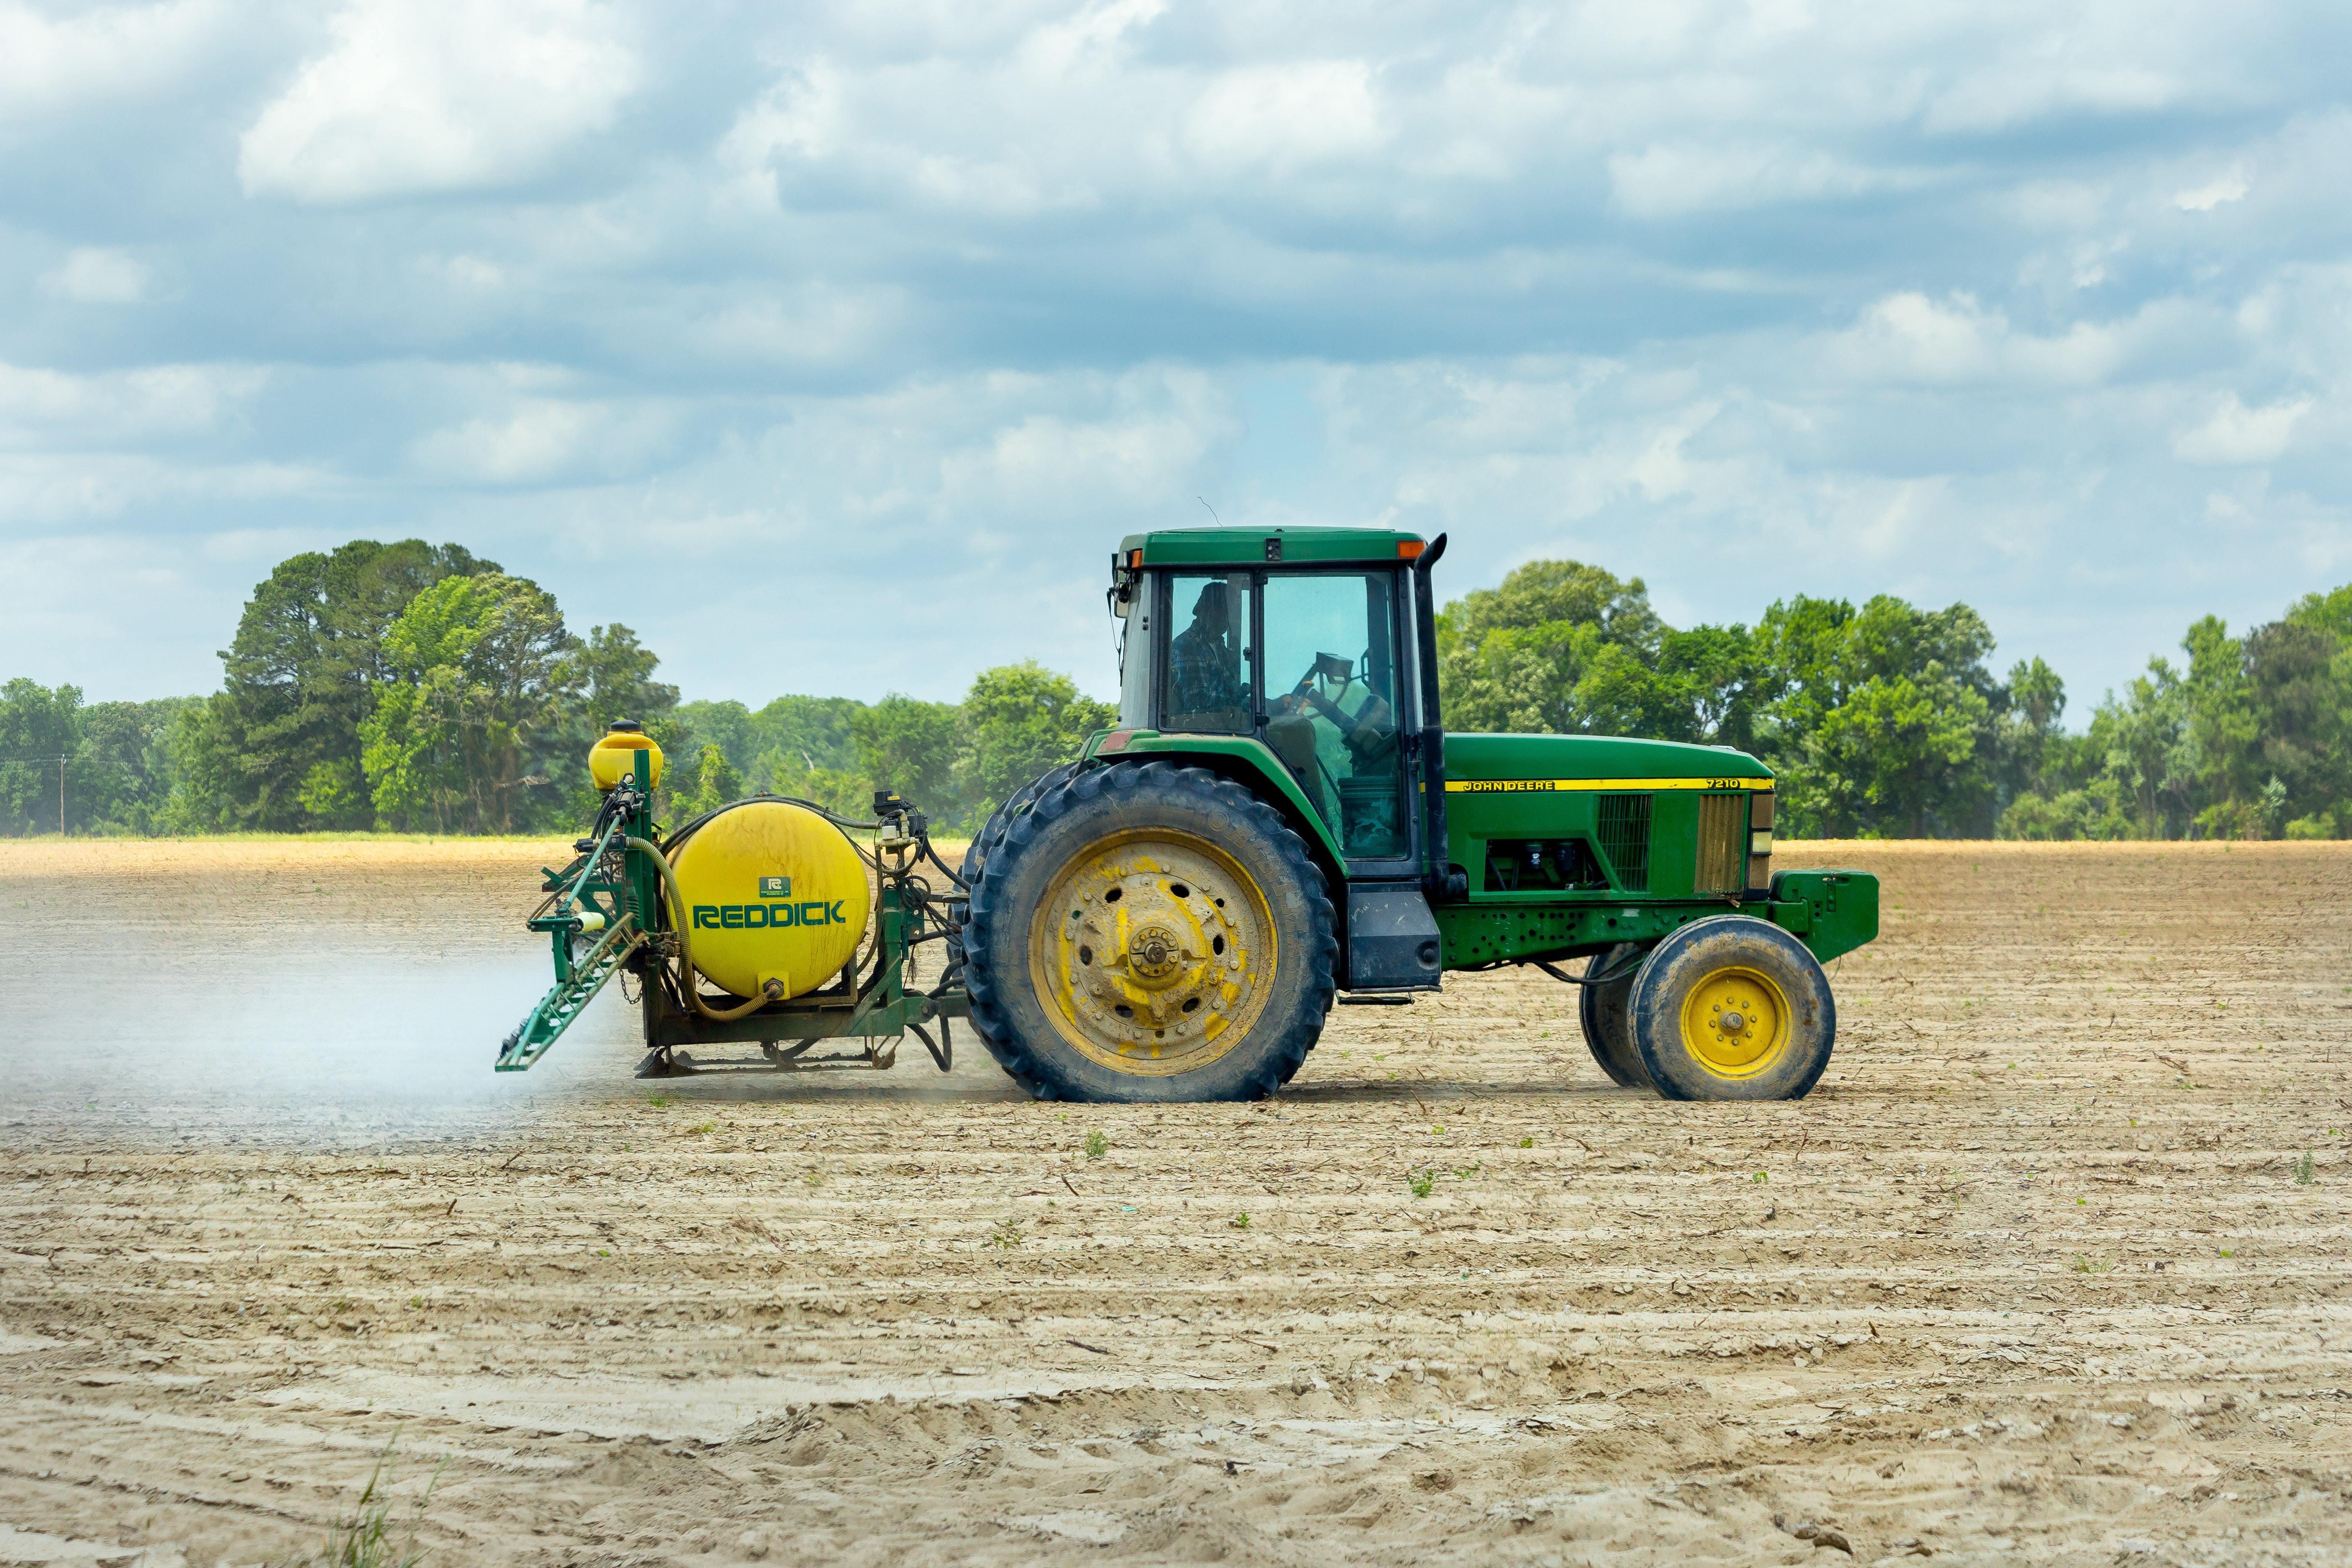 Spraying new crop